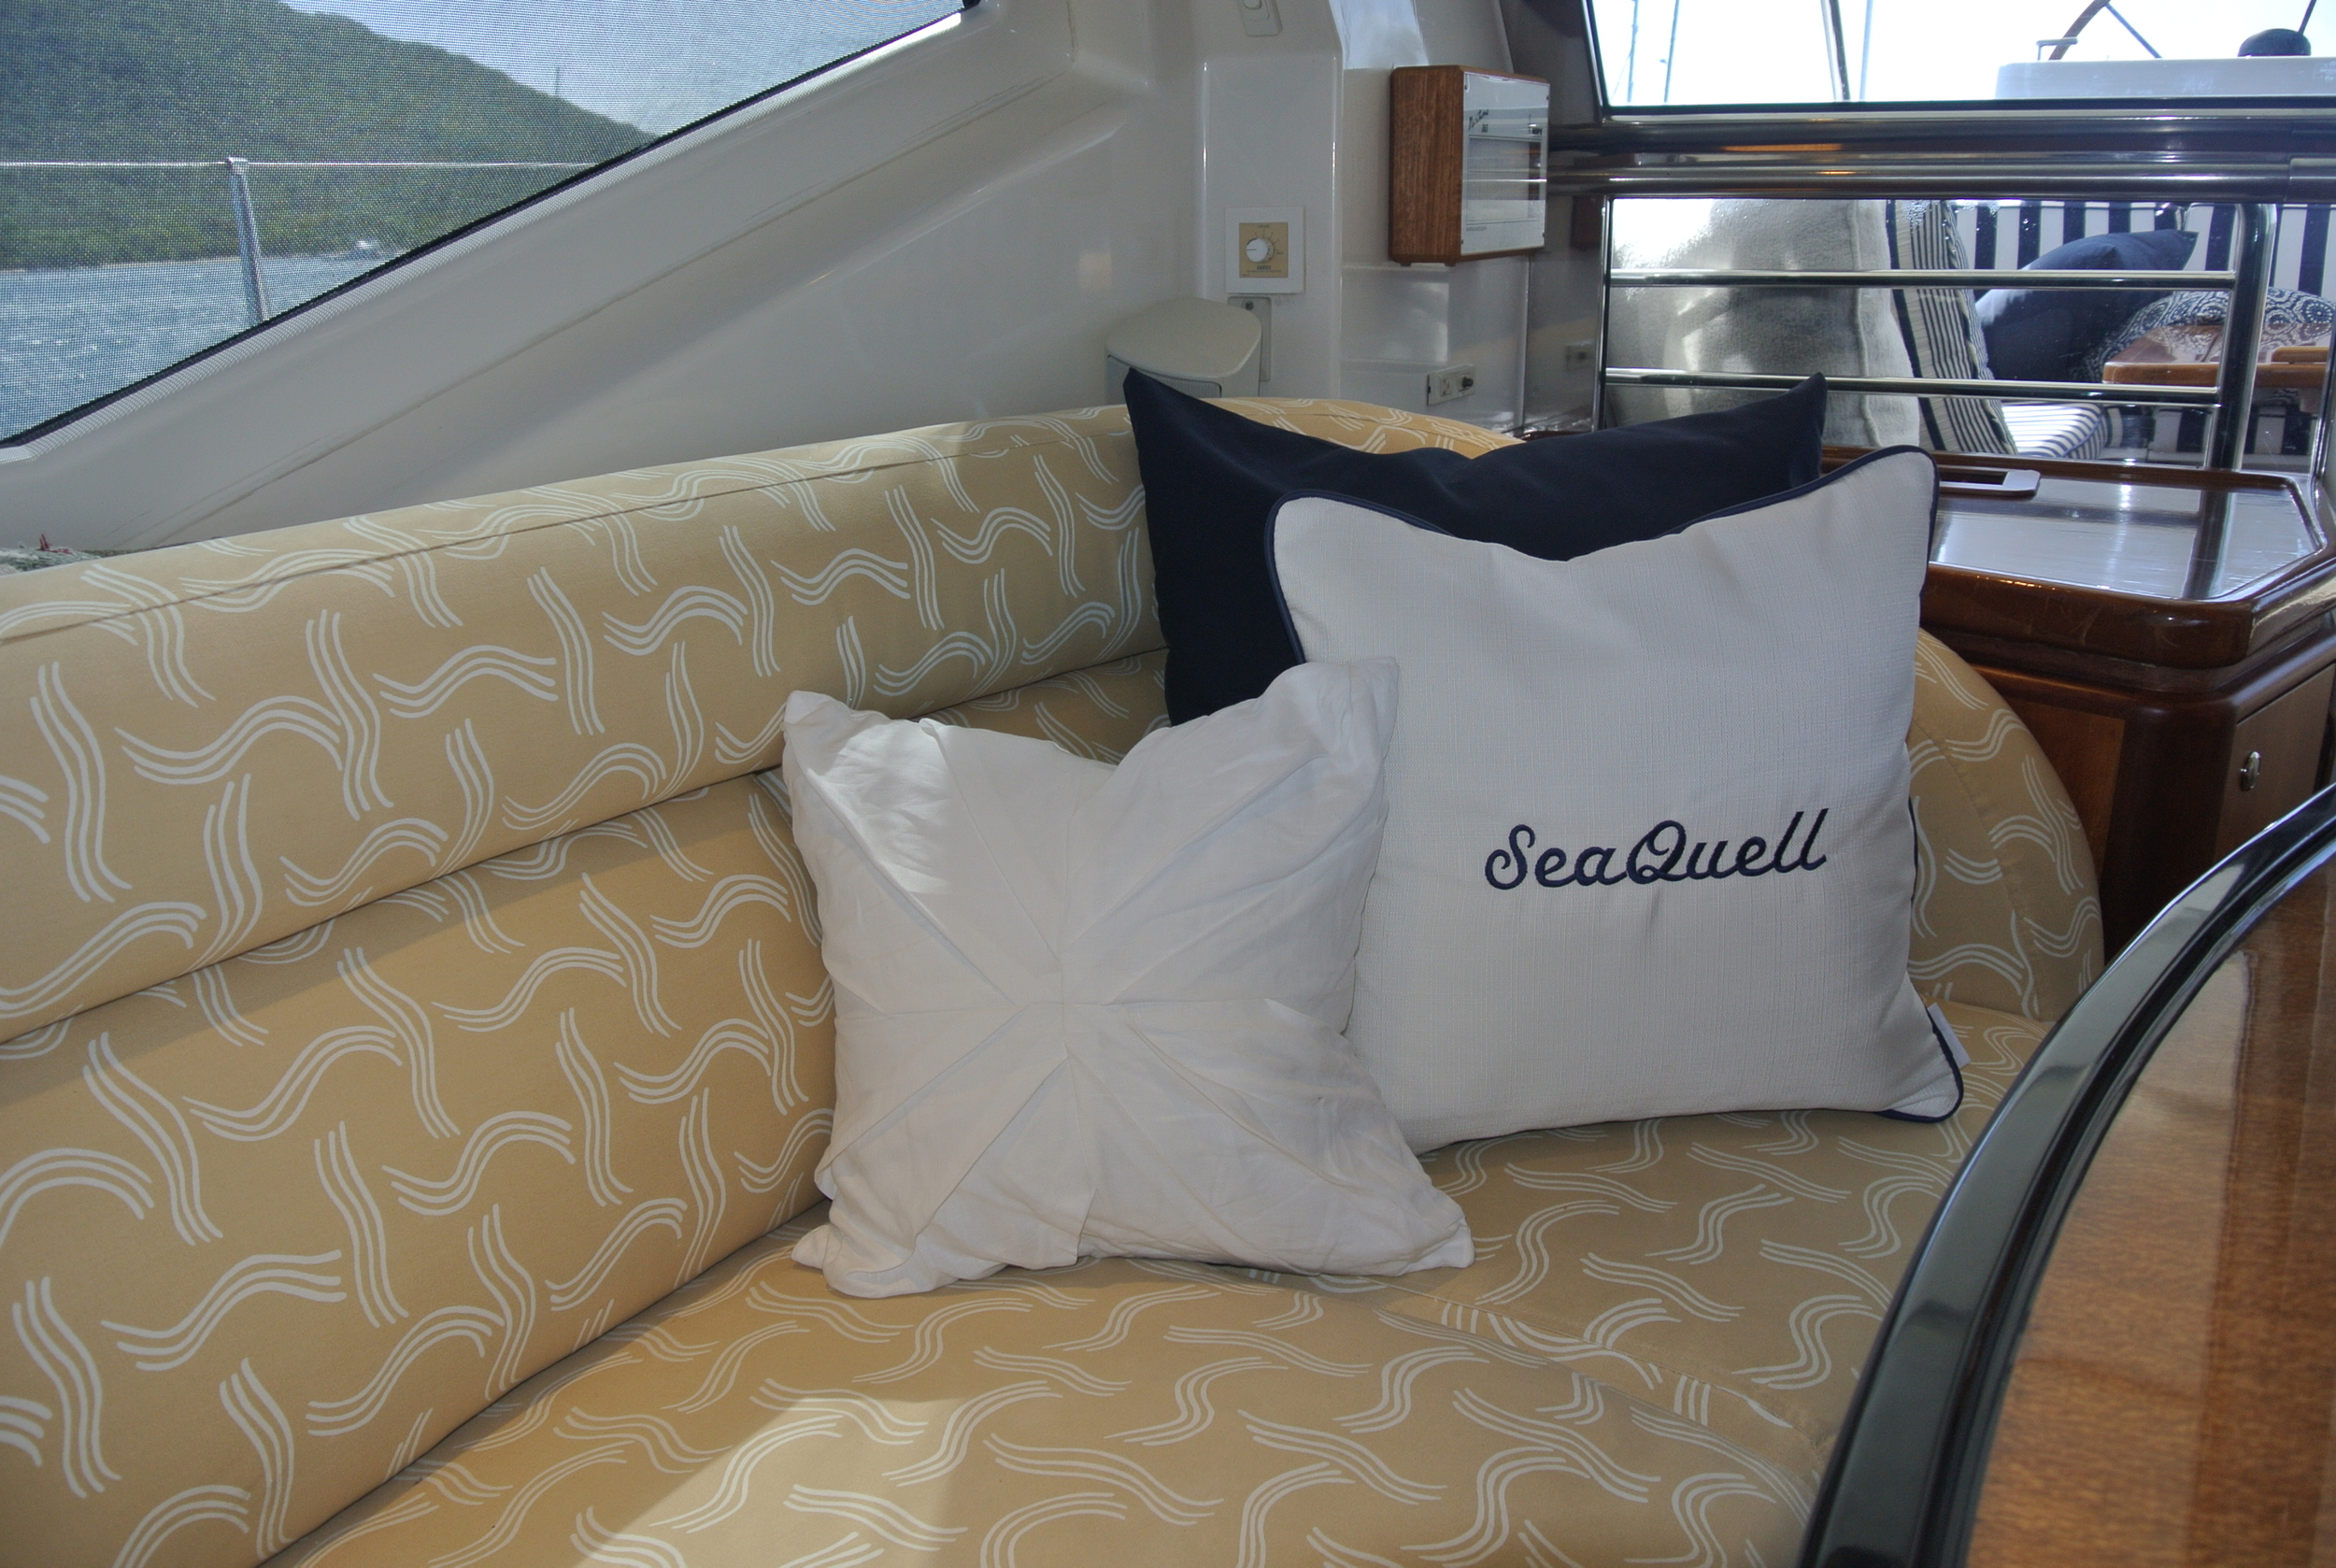 Boat Interiors Yacht Interiors by Maloney Interiors Rhode ISland SeaQuell.JPG